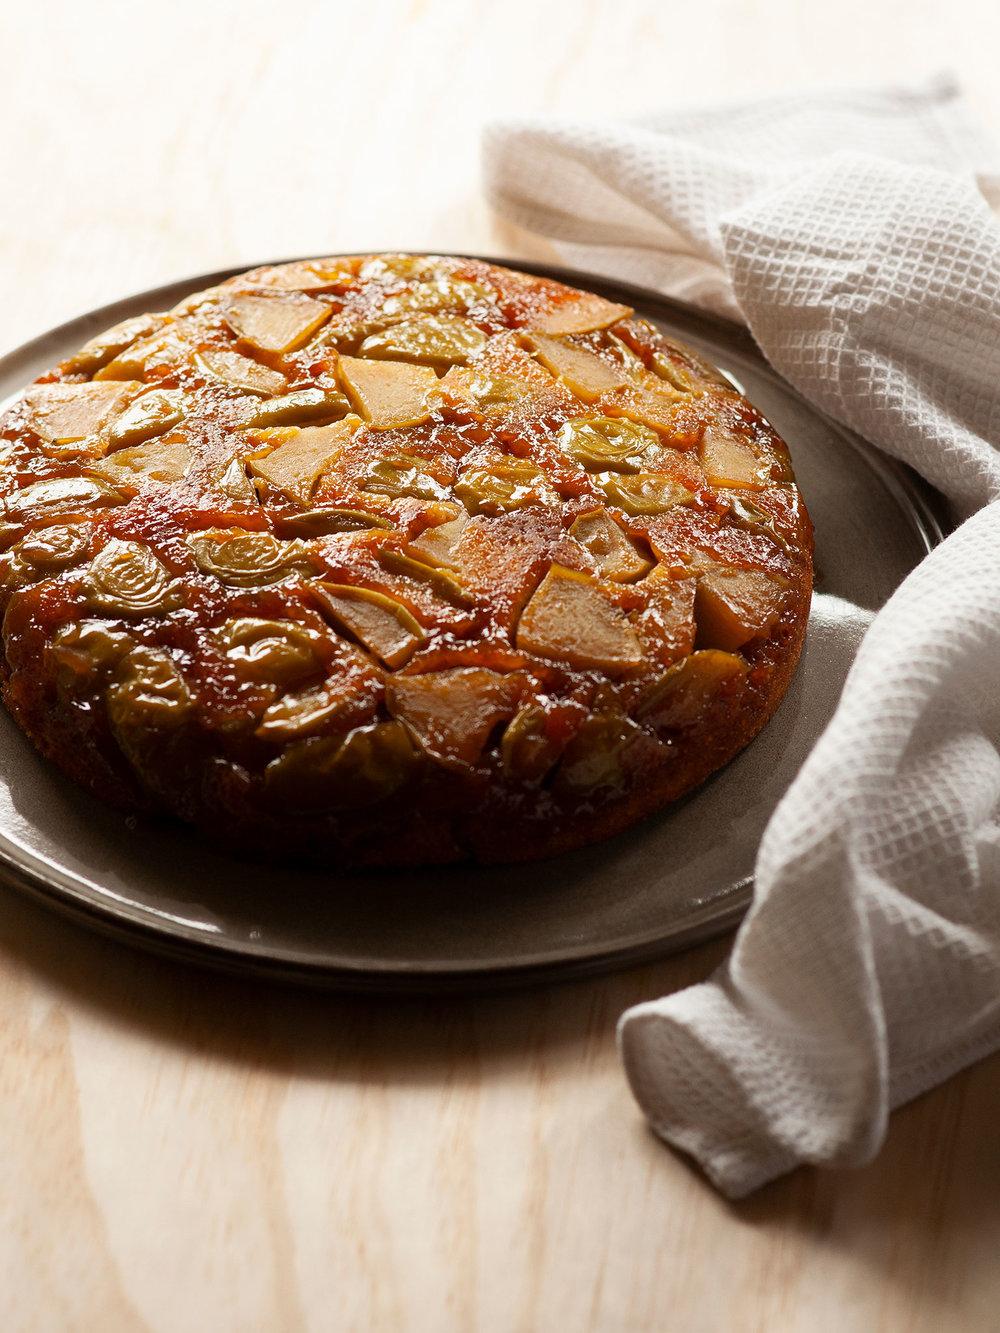 2-188-Apple-Caramel-Sponge-Cake-web.jpg